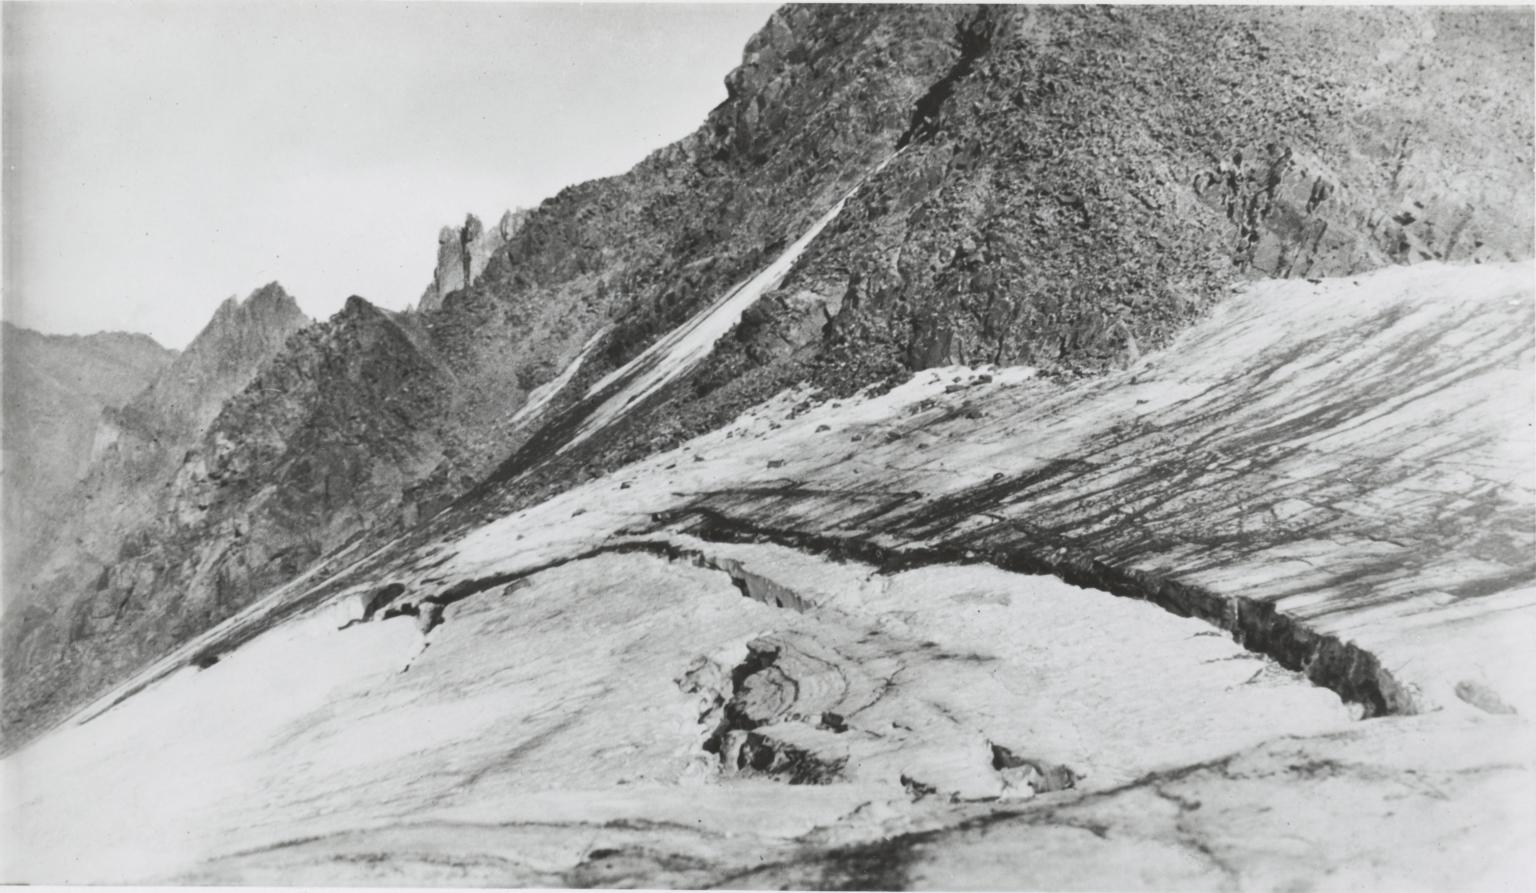 Grasshopper Glacier West, Montana, United States